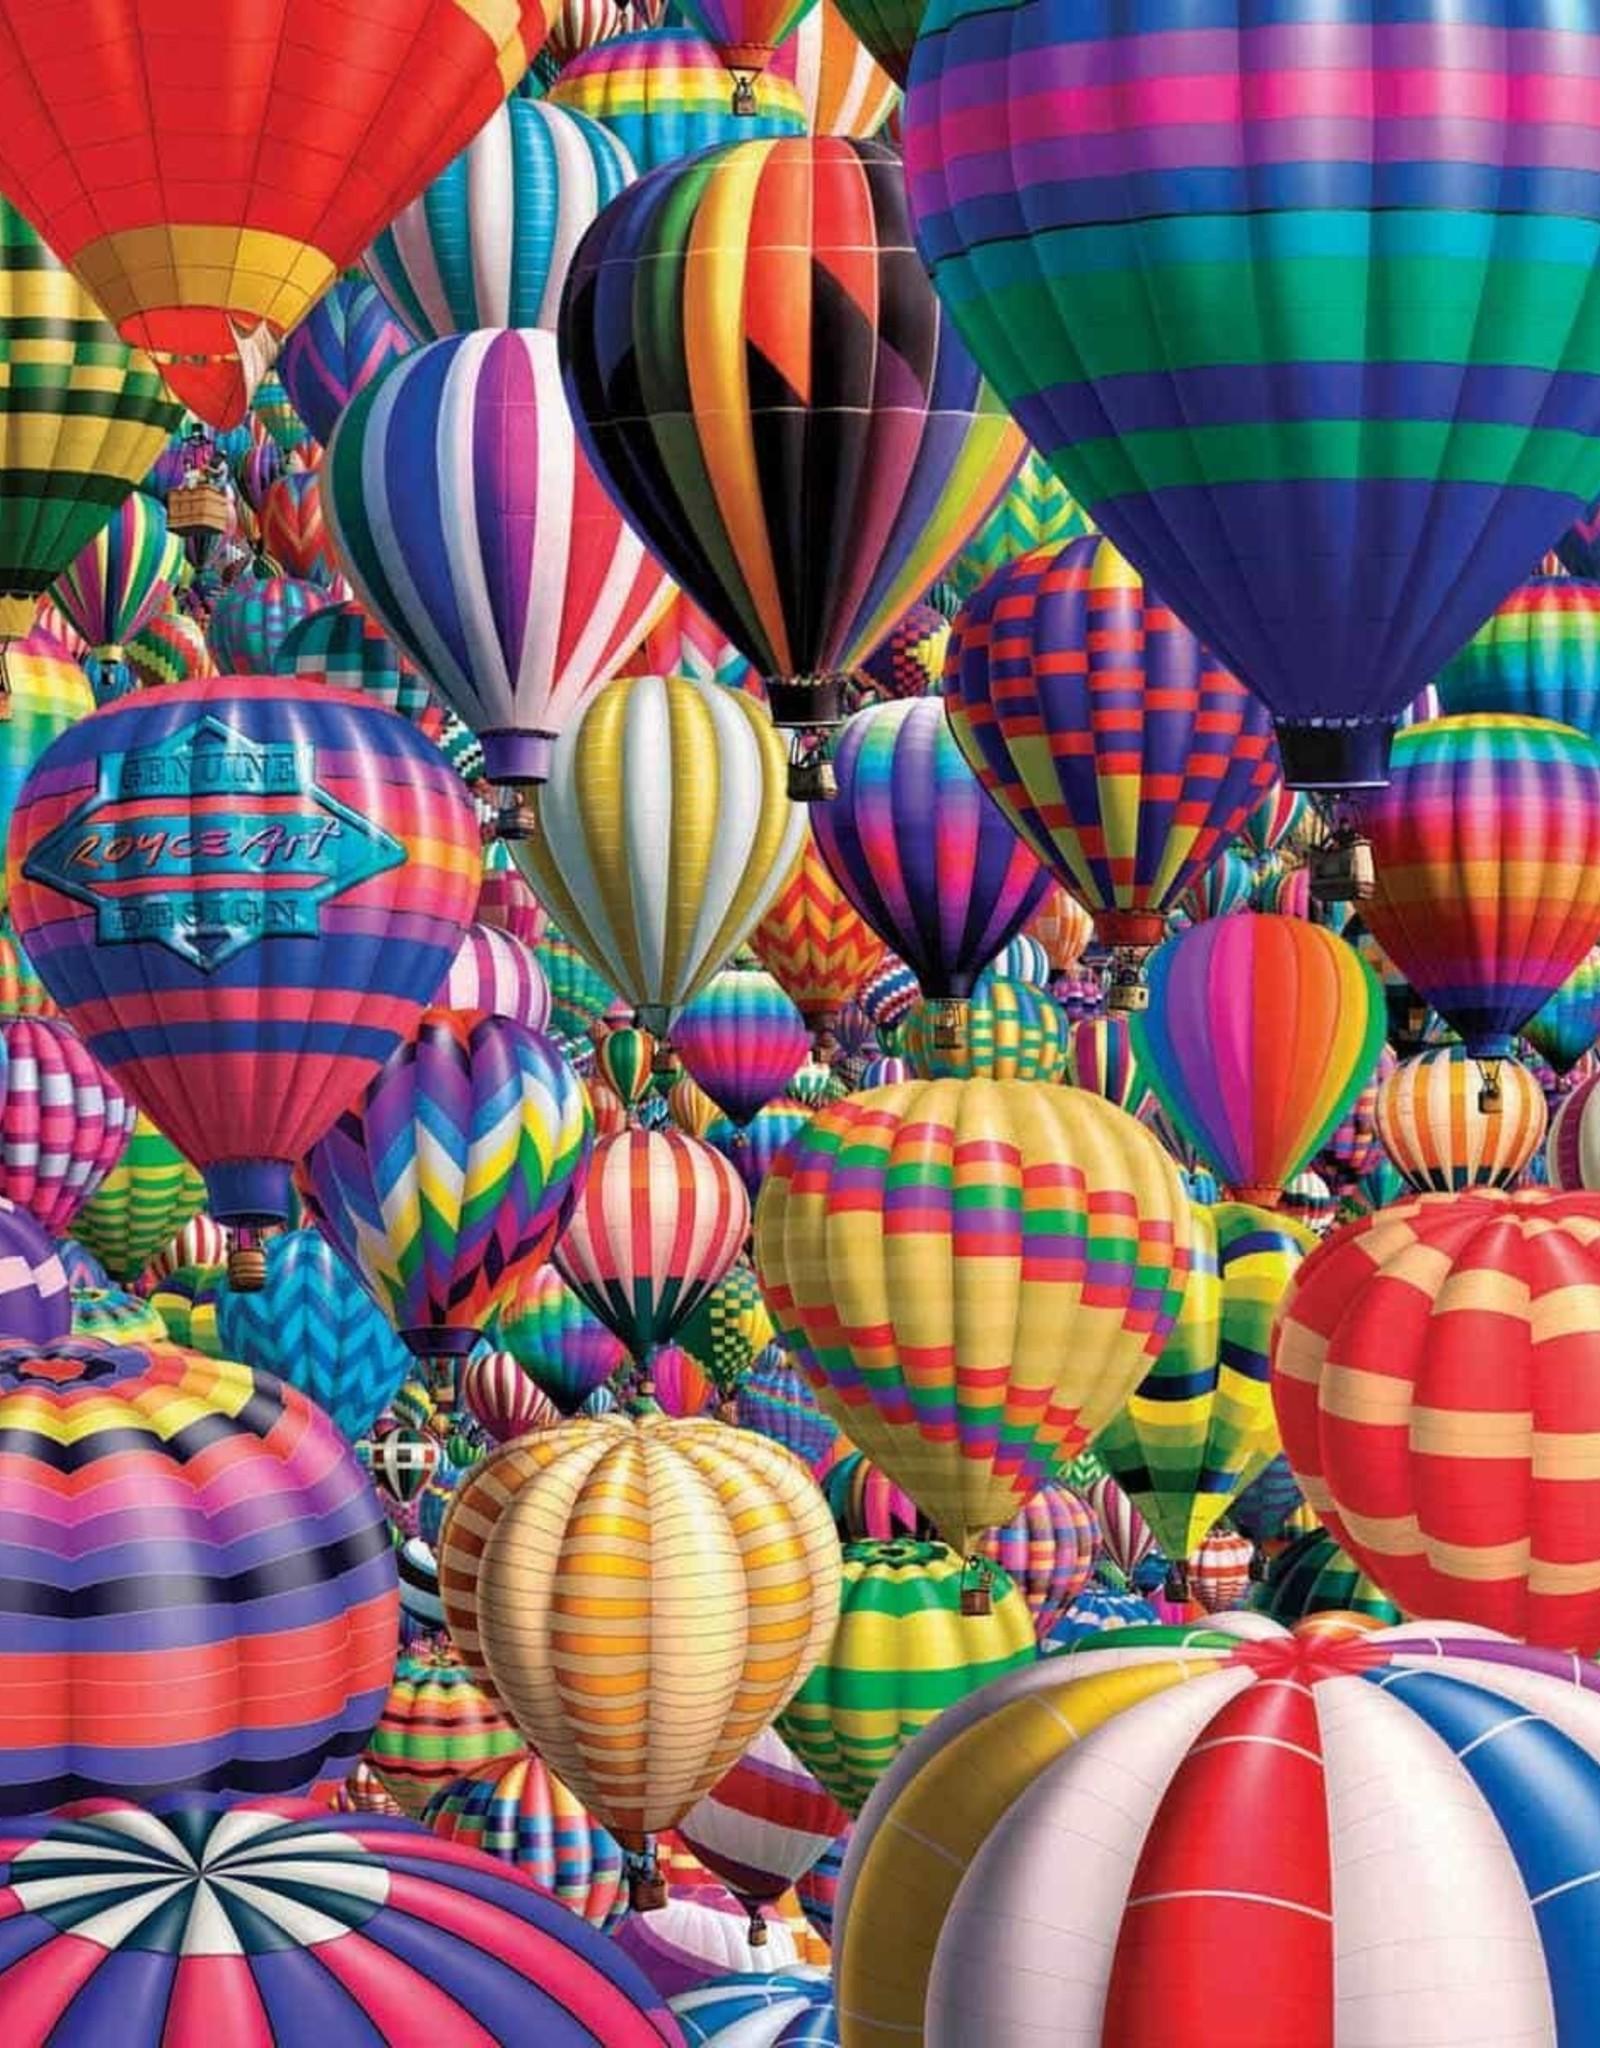 White Mountain HOT AIR BALLOONS 1000 PIECES